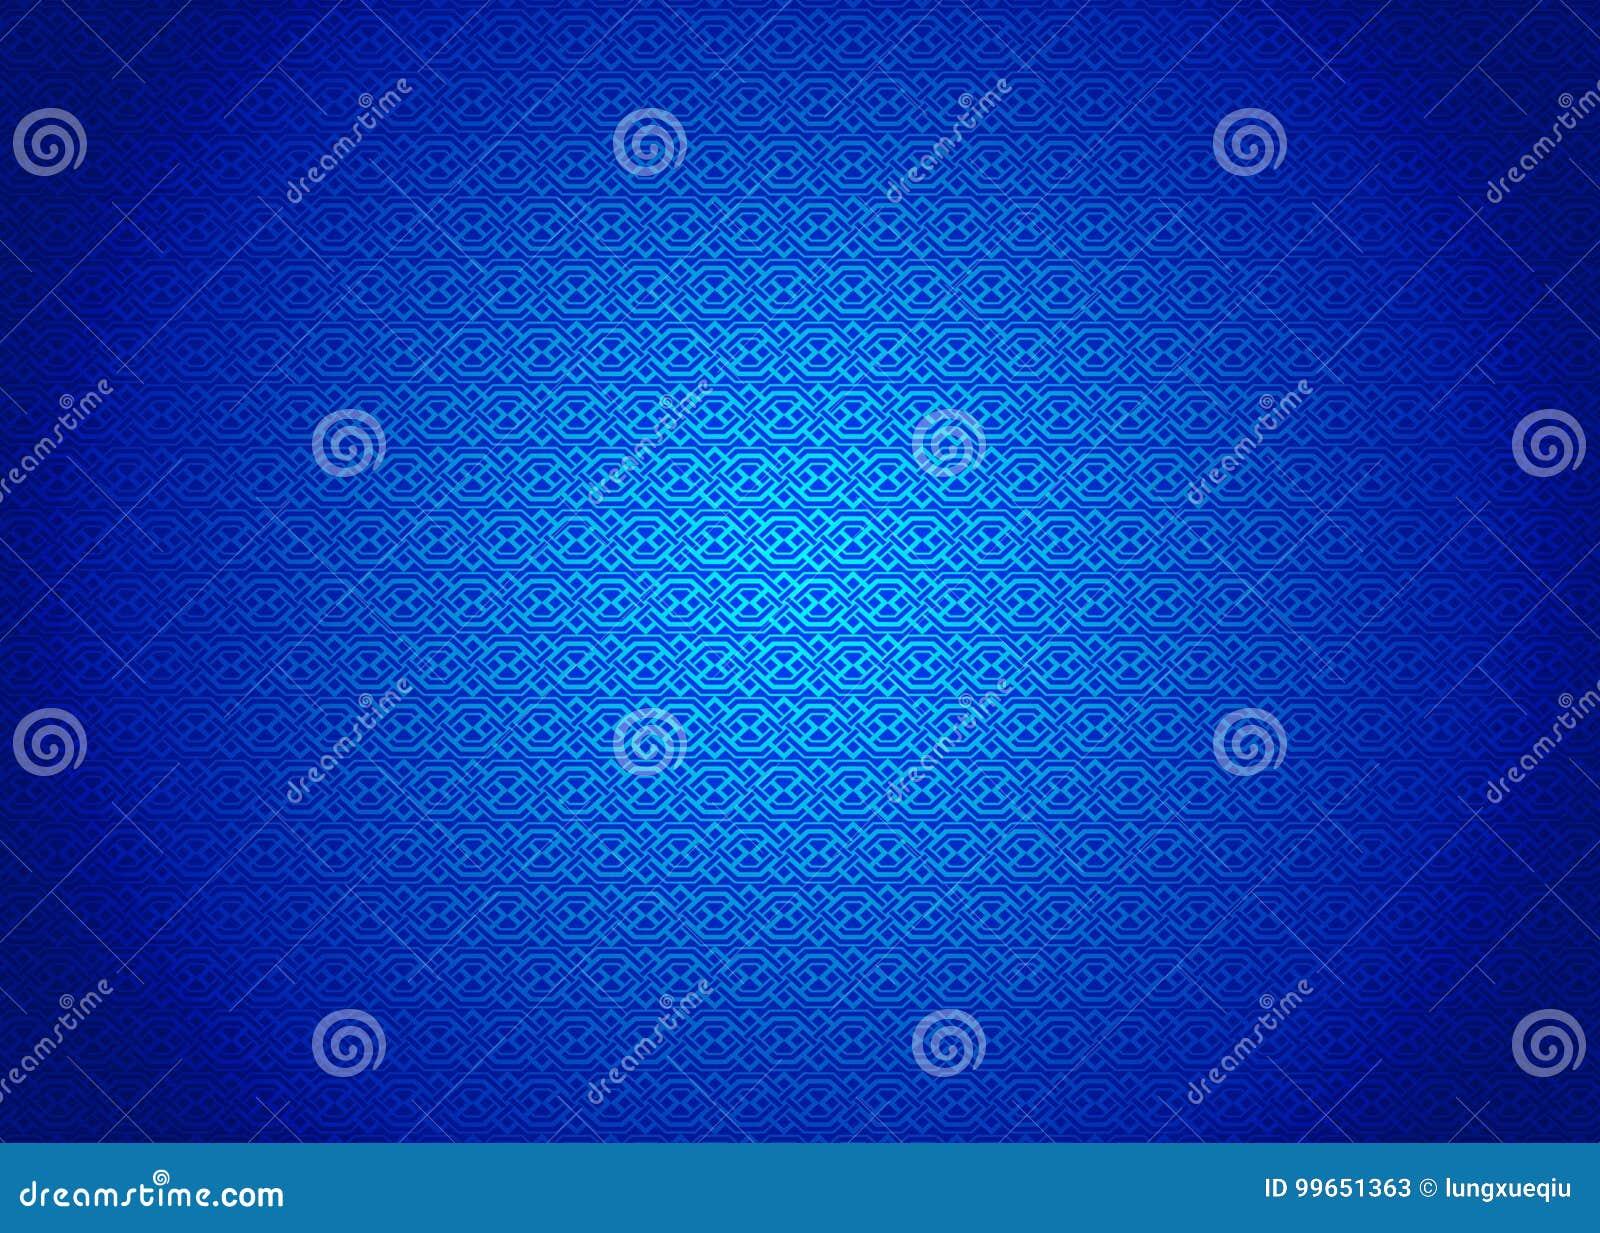 Techno, Oriental, Ornamental, Chinese, Arabic, Islamic, Blue Pattern Texture Background. Imlek, Ramadan, Festival Wallpaper.